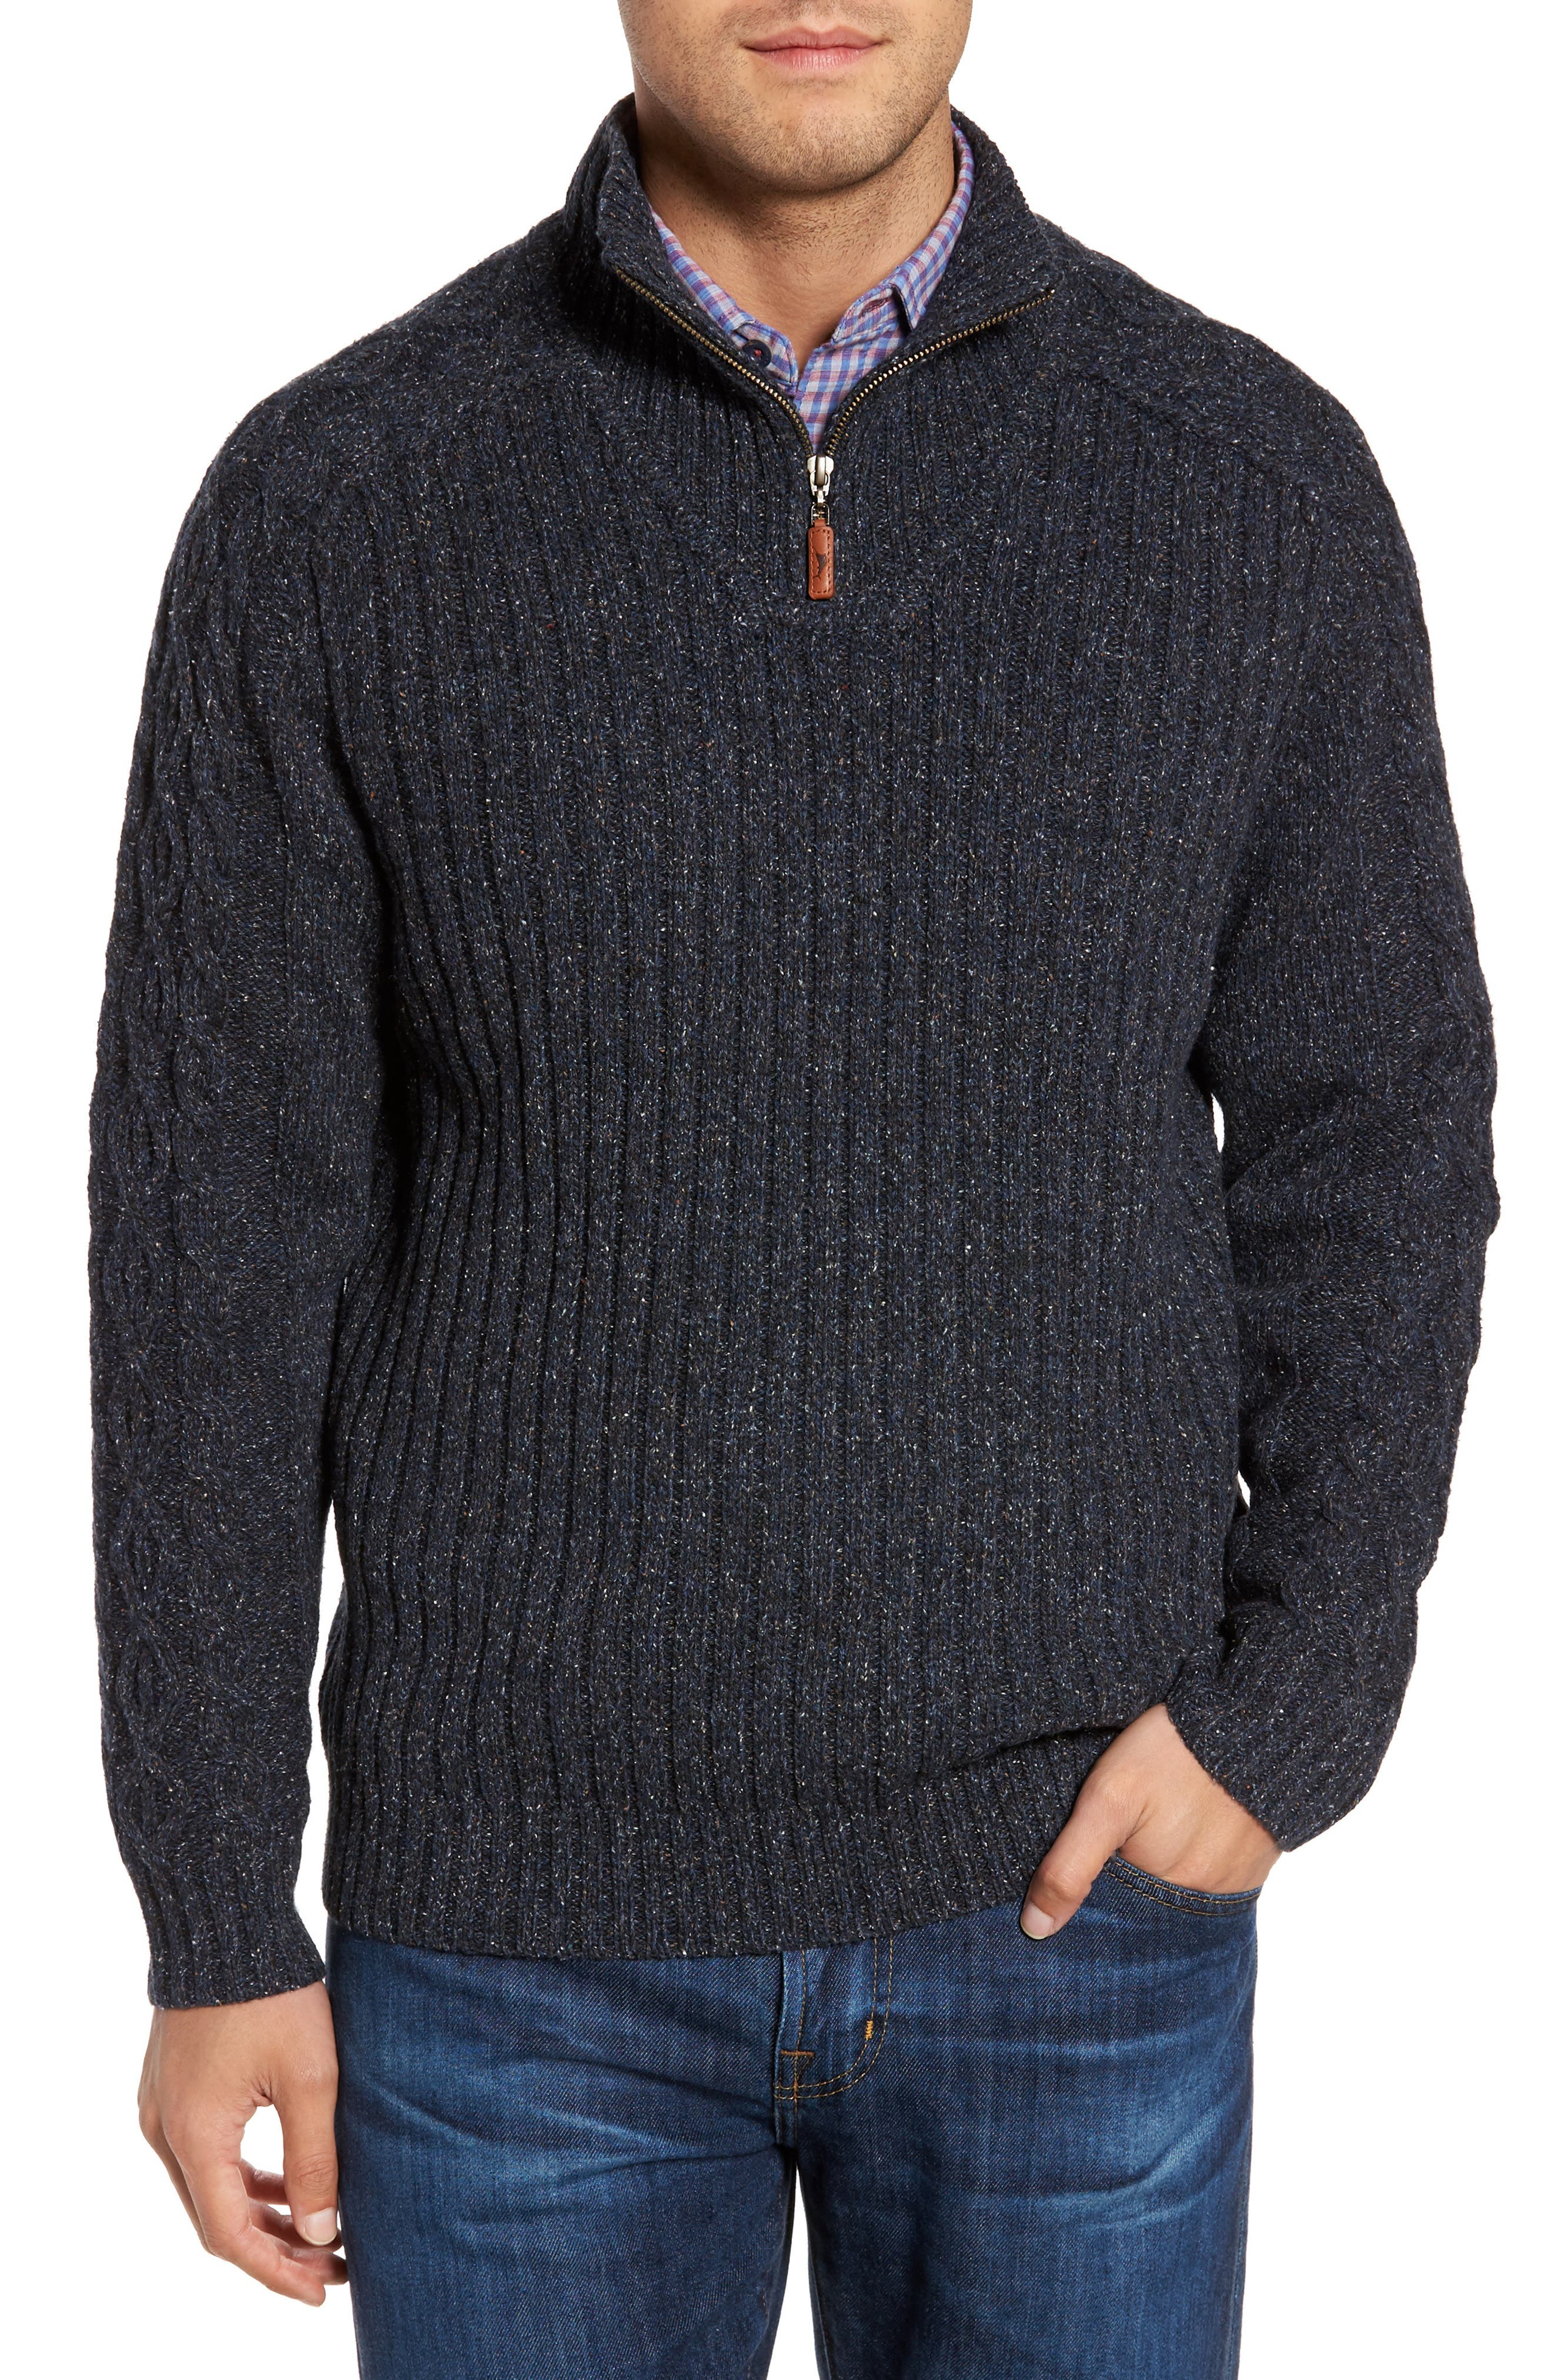 Hamada Quarter Zip Sweater,                             Main thumbnail 1, color,                             401